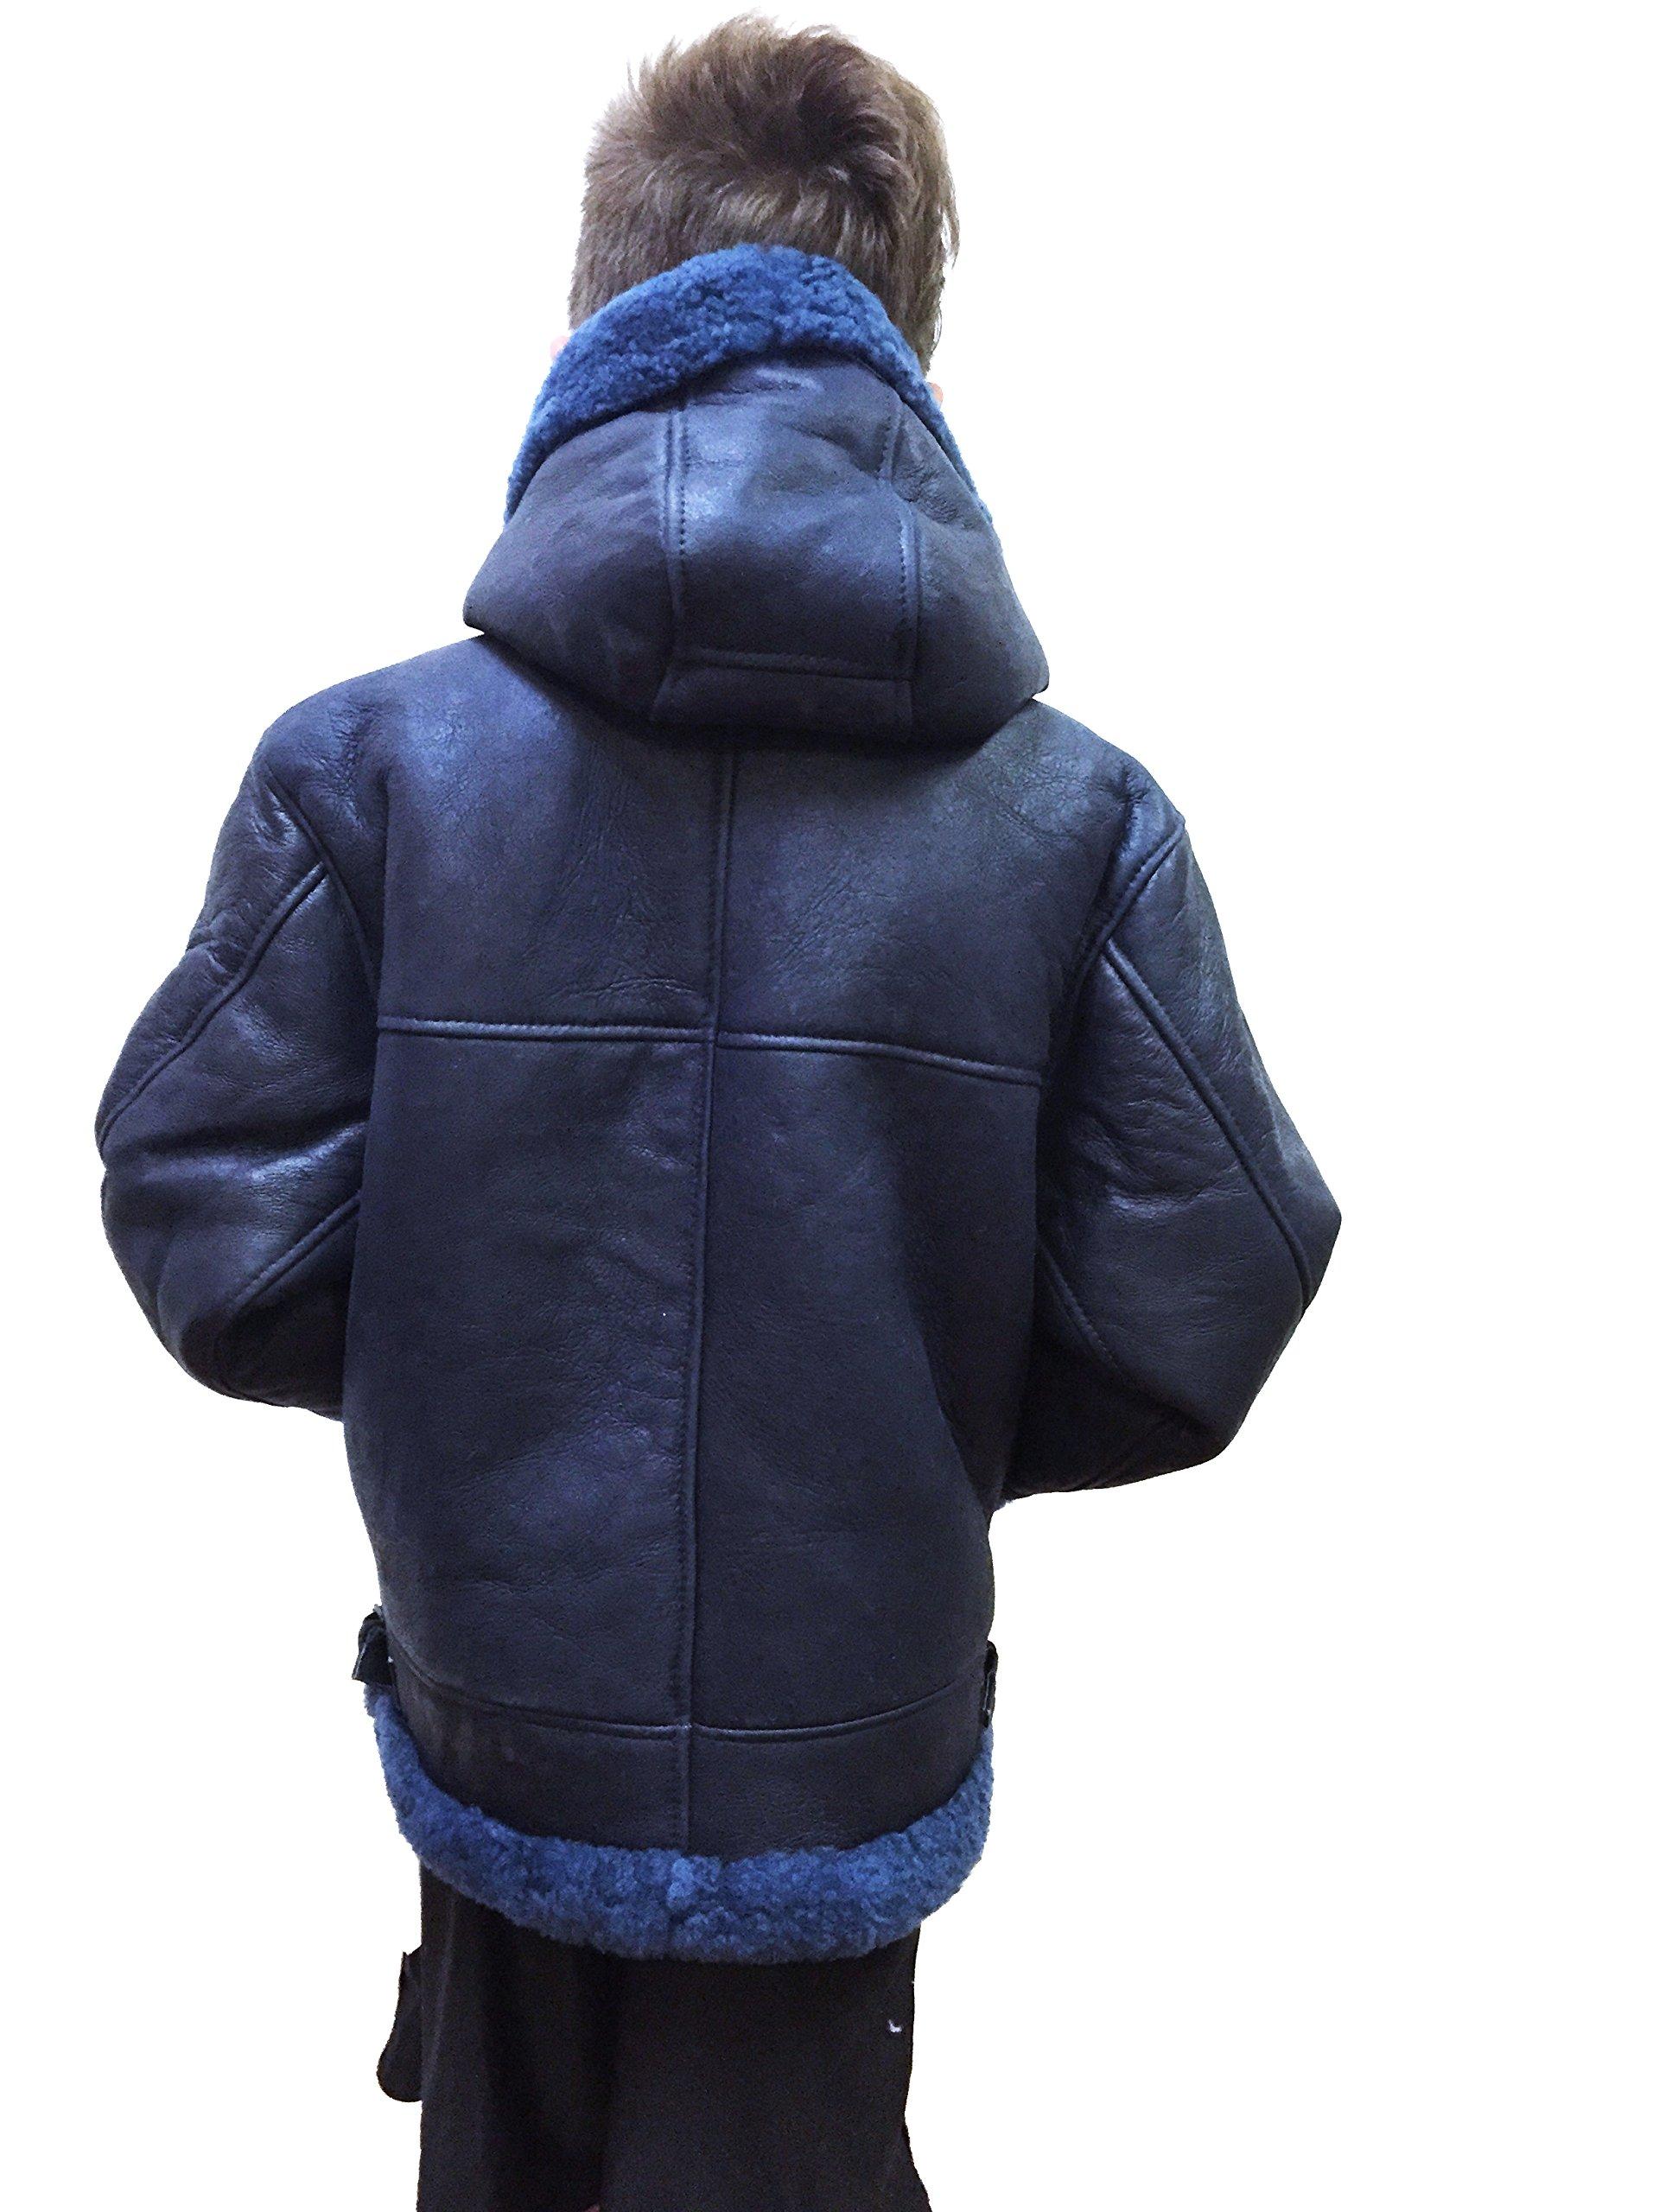 Kids B-3 Genuine Shearling Leather Bomber Jacket Winter Aviator Coat Real Fur Hood (Size 6, Navy/Fur) by Jakewood (Image #2)